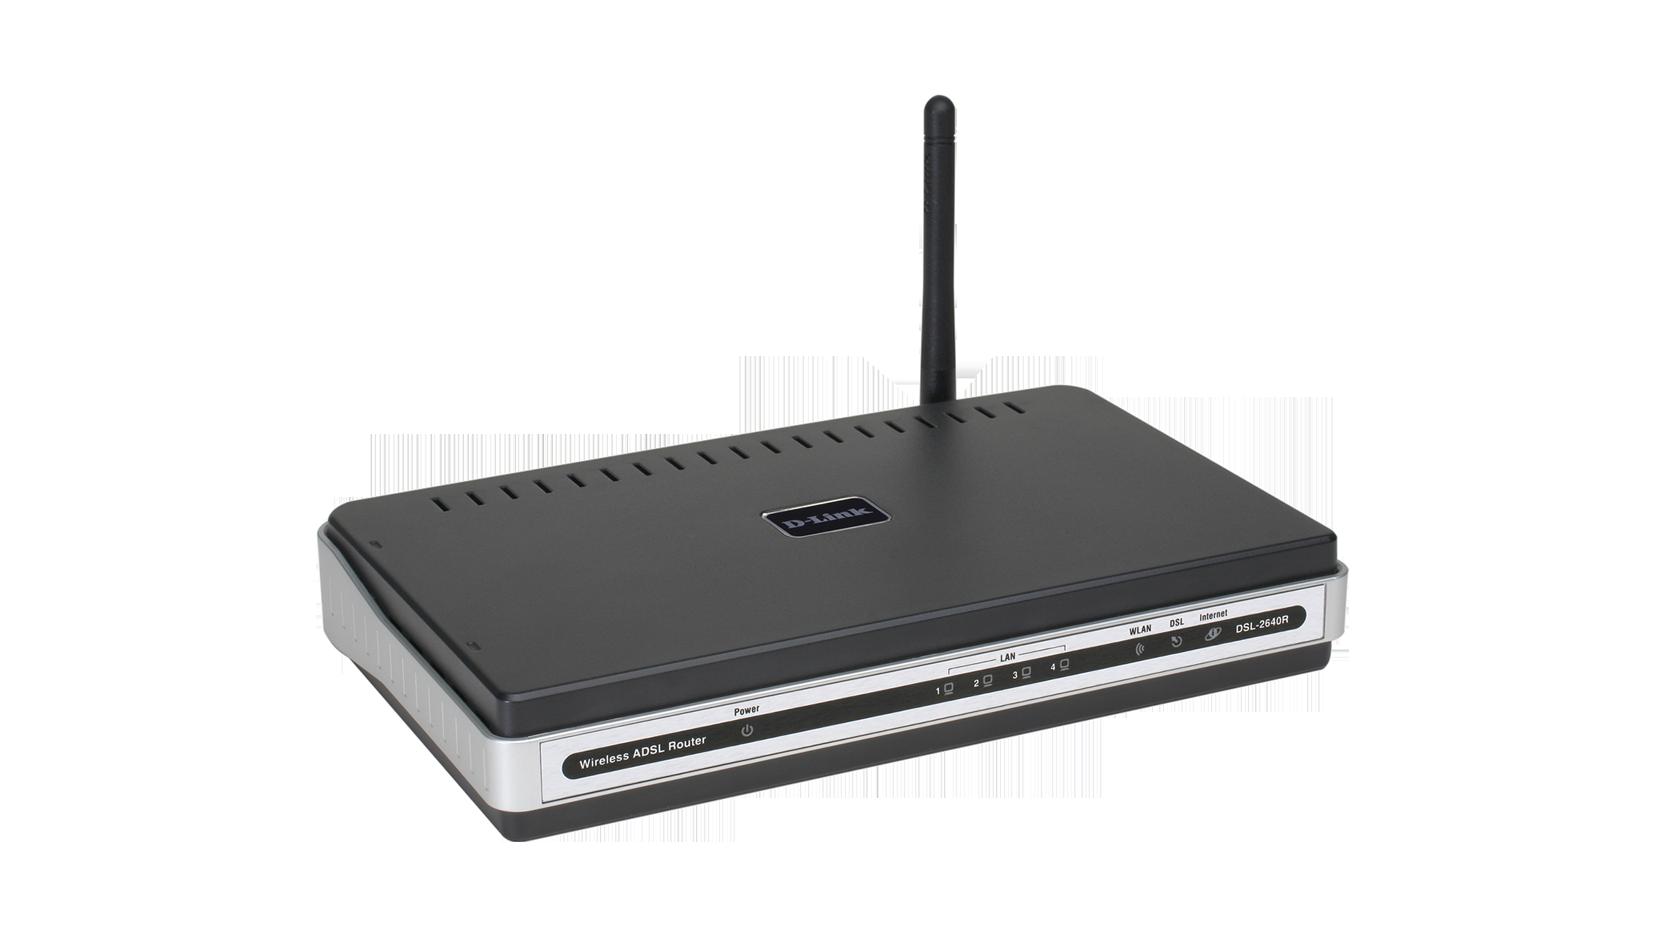 DSL-2640R Wireless G ADSL2+ Modem Router | D-Link UK